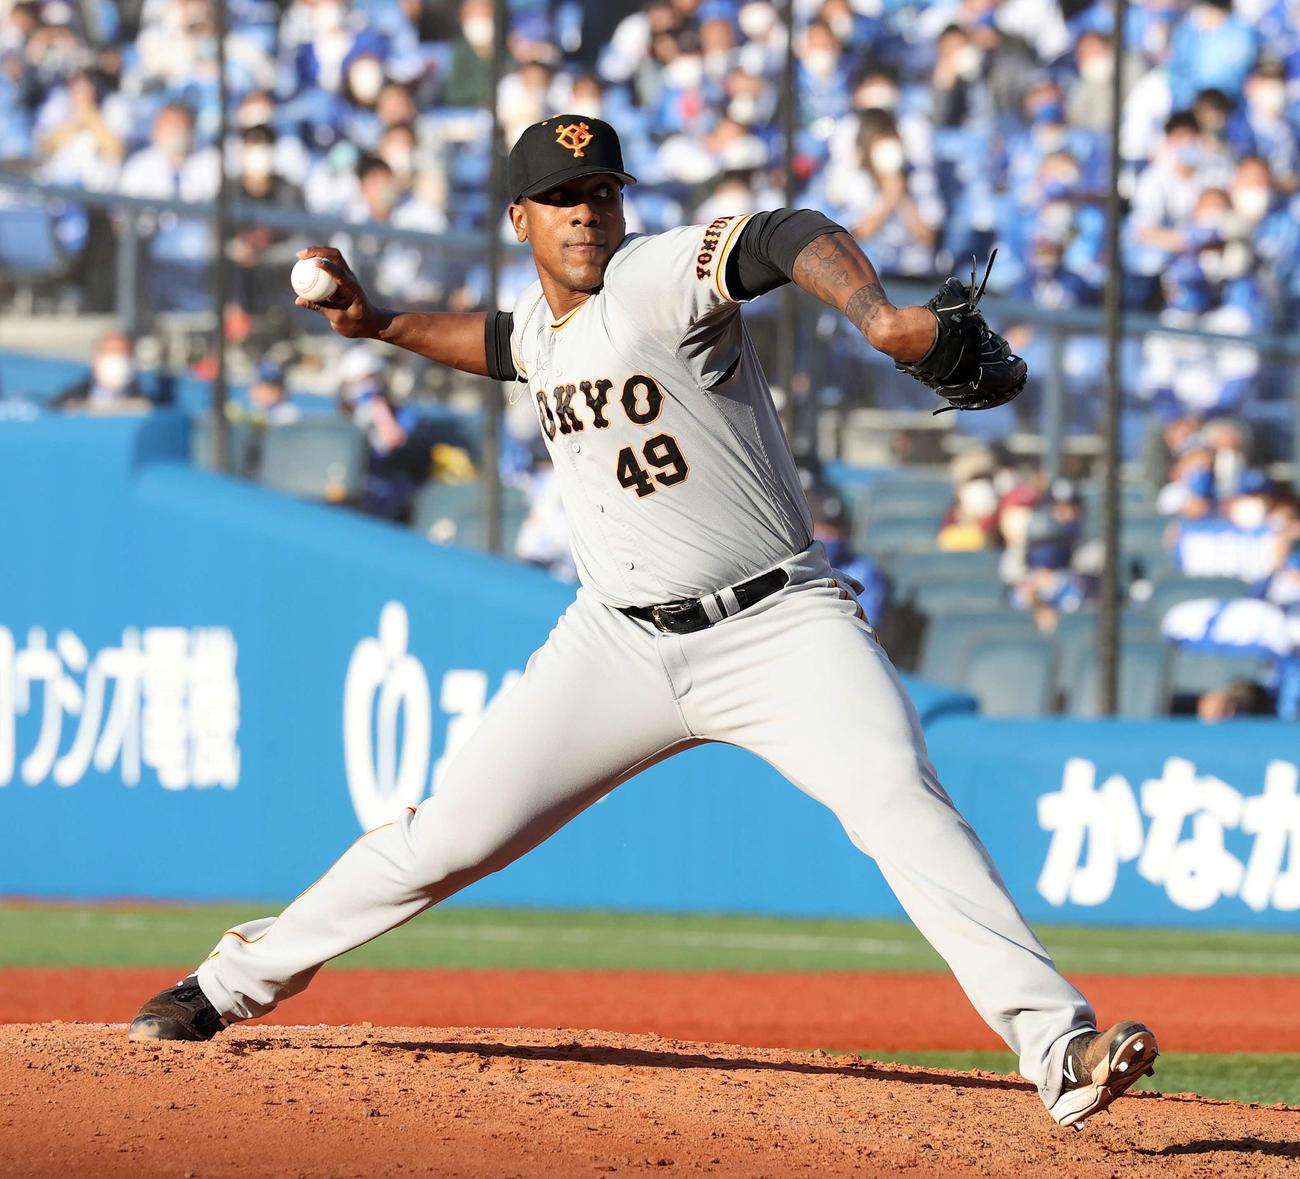 DeNA対巨人 5番手で力投する巨人ビエイラ(撮影・鈴木正人)